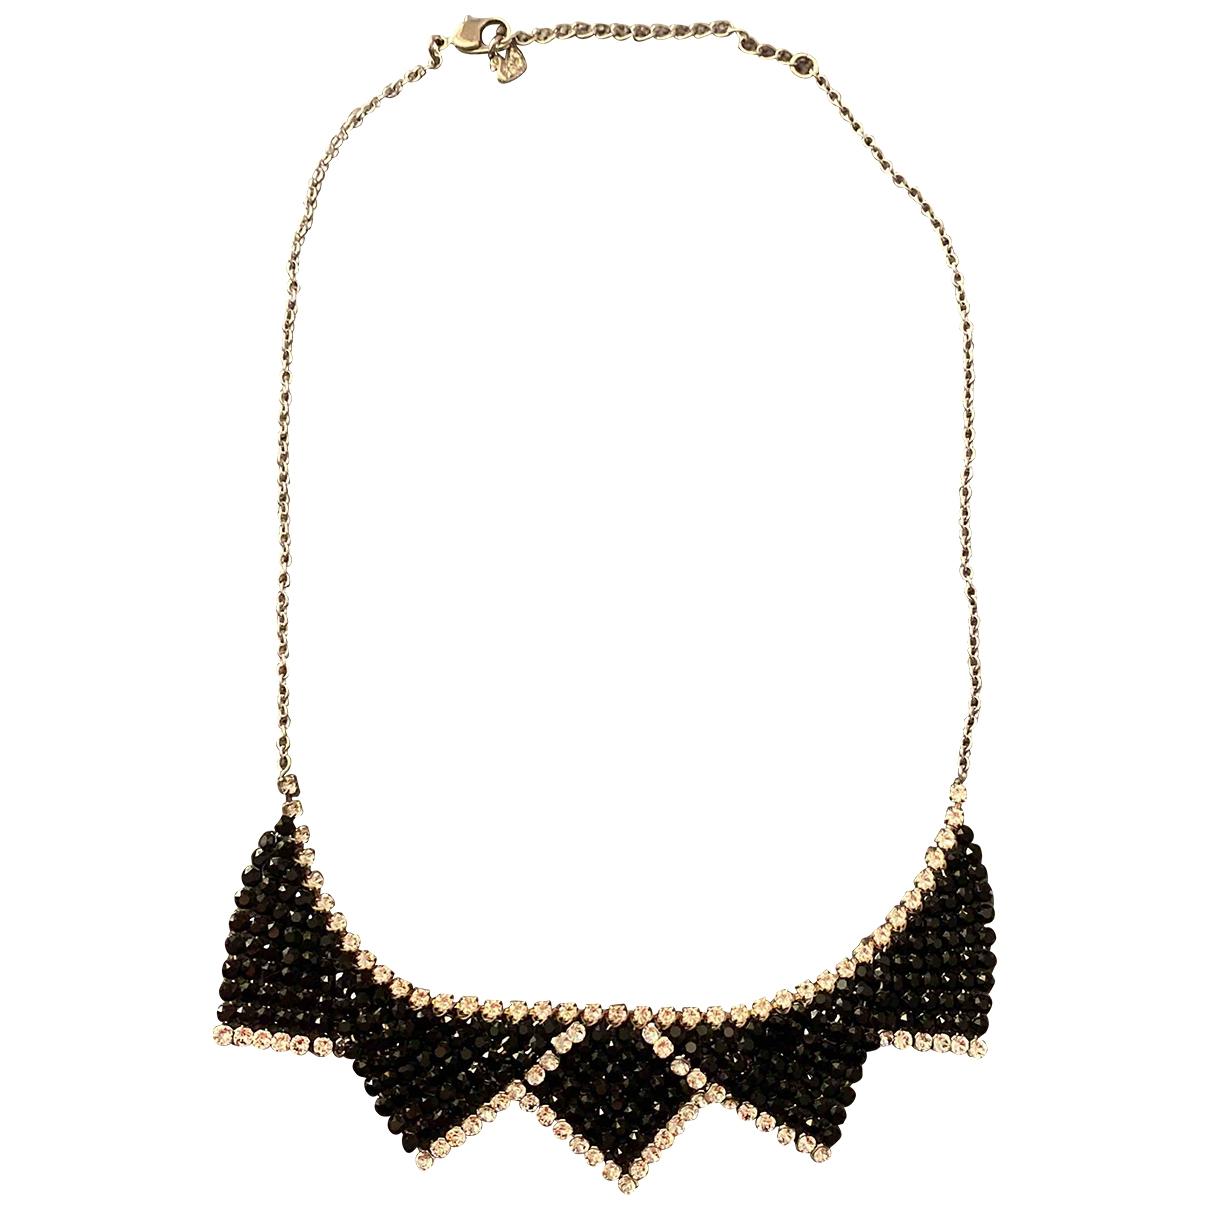 Swarovski \N Black Crystal necklace for Women \N